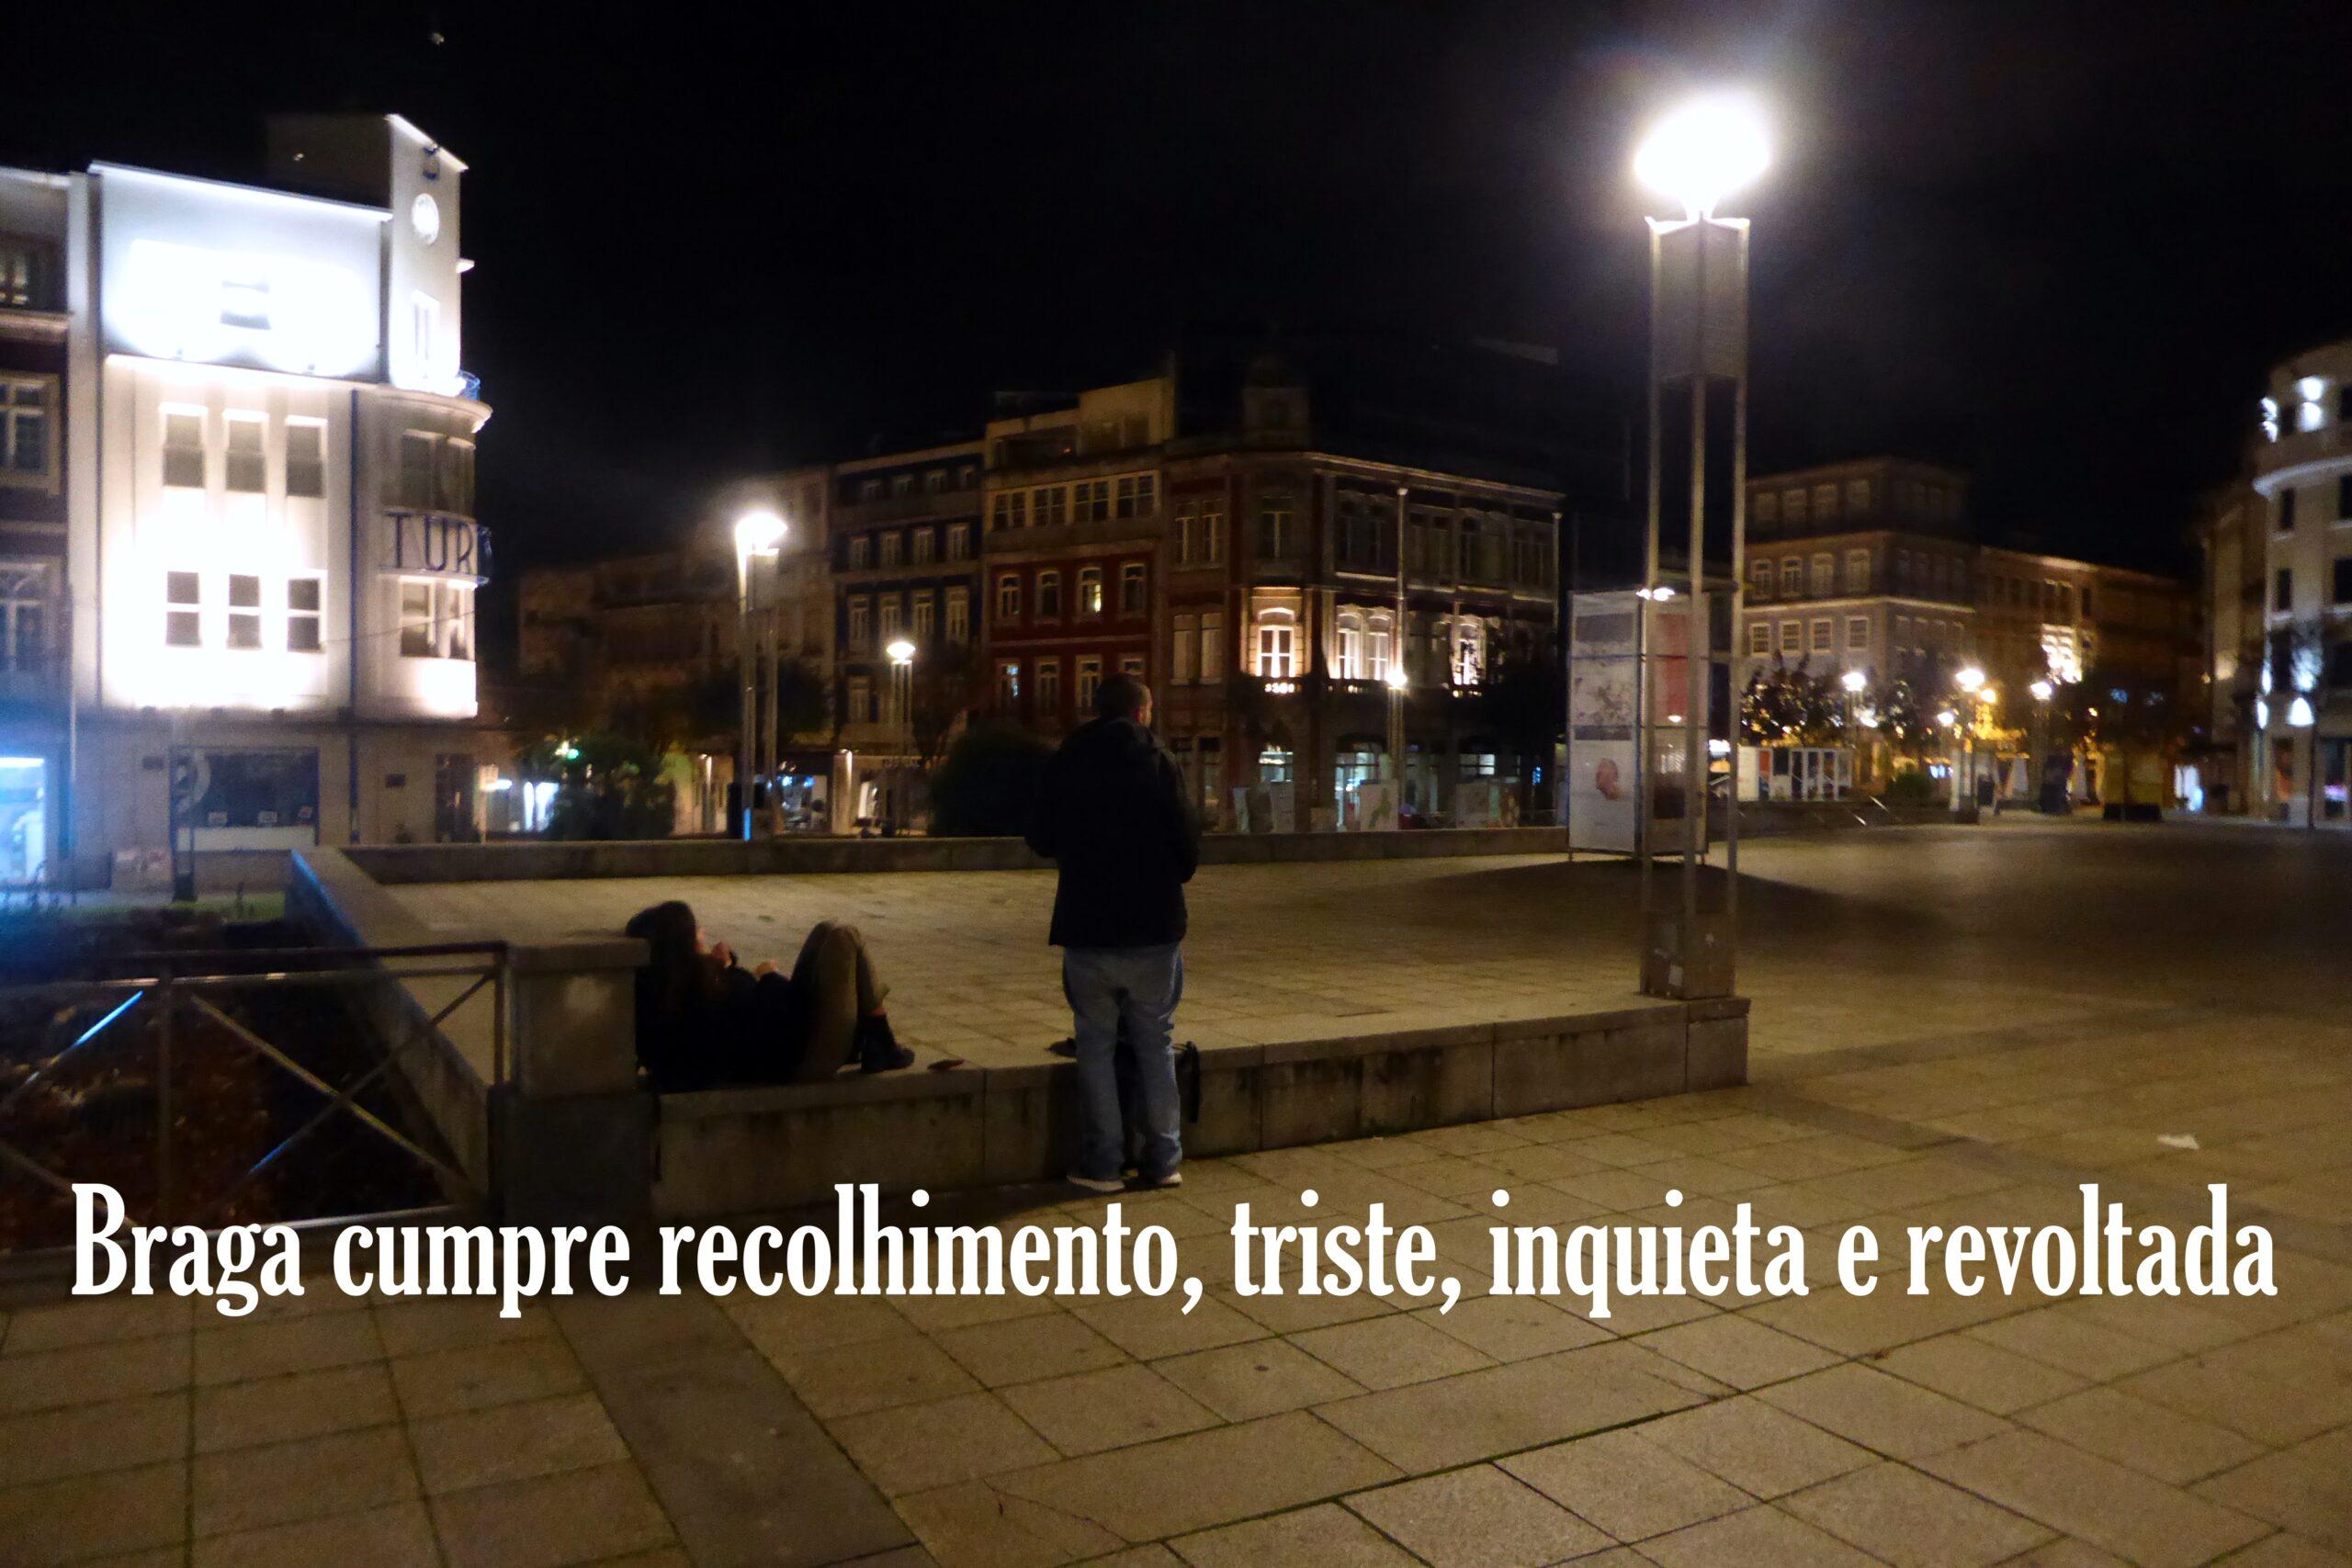 Braga cumpre recolhimento, triste, inquieta e revoltada